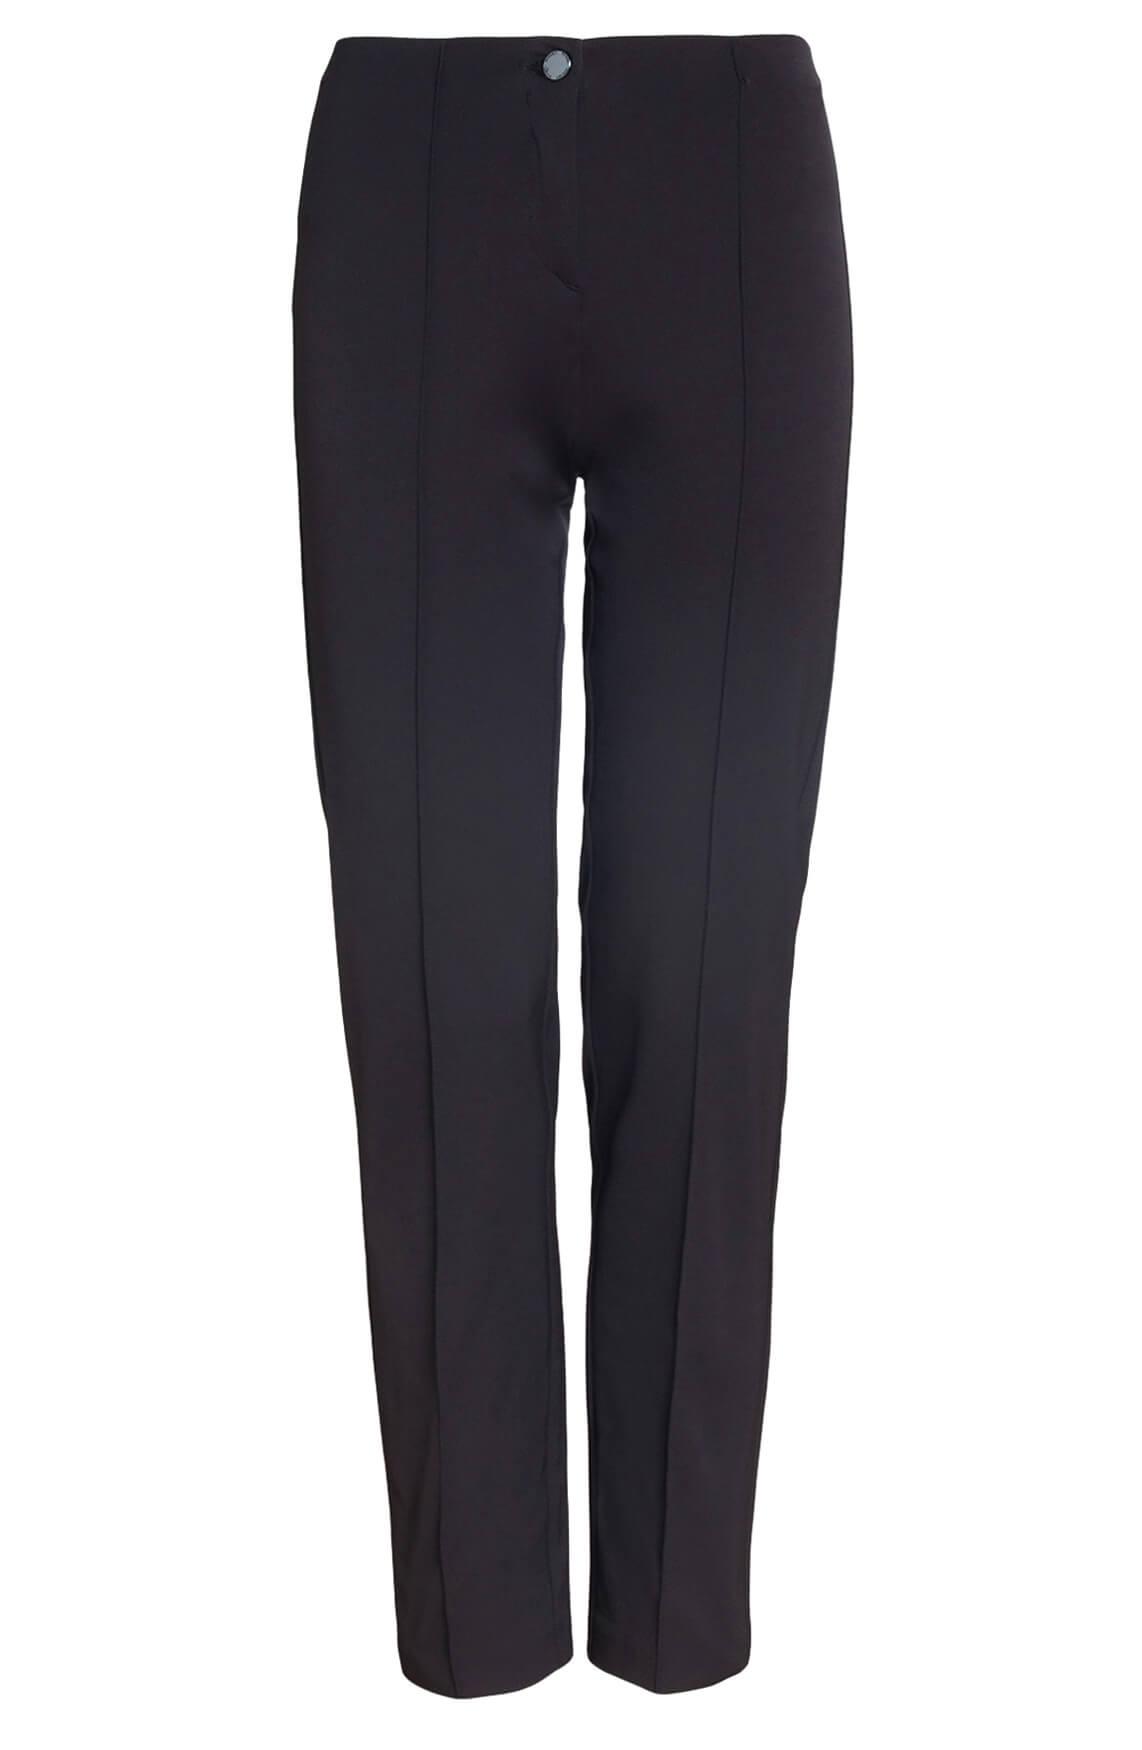 Rosner Dames L30 Alisa pantalon Bruin